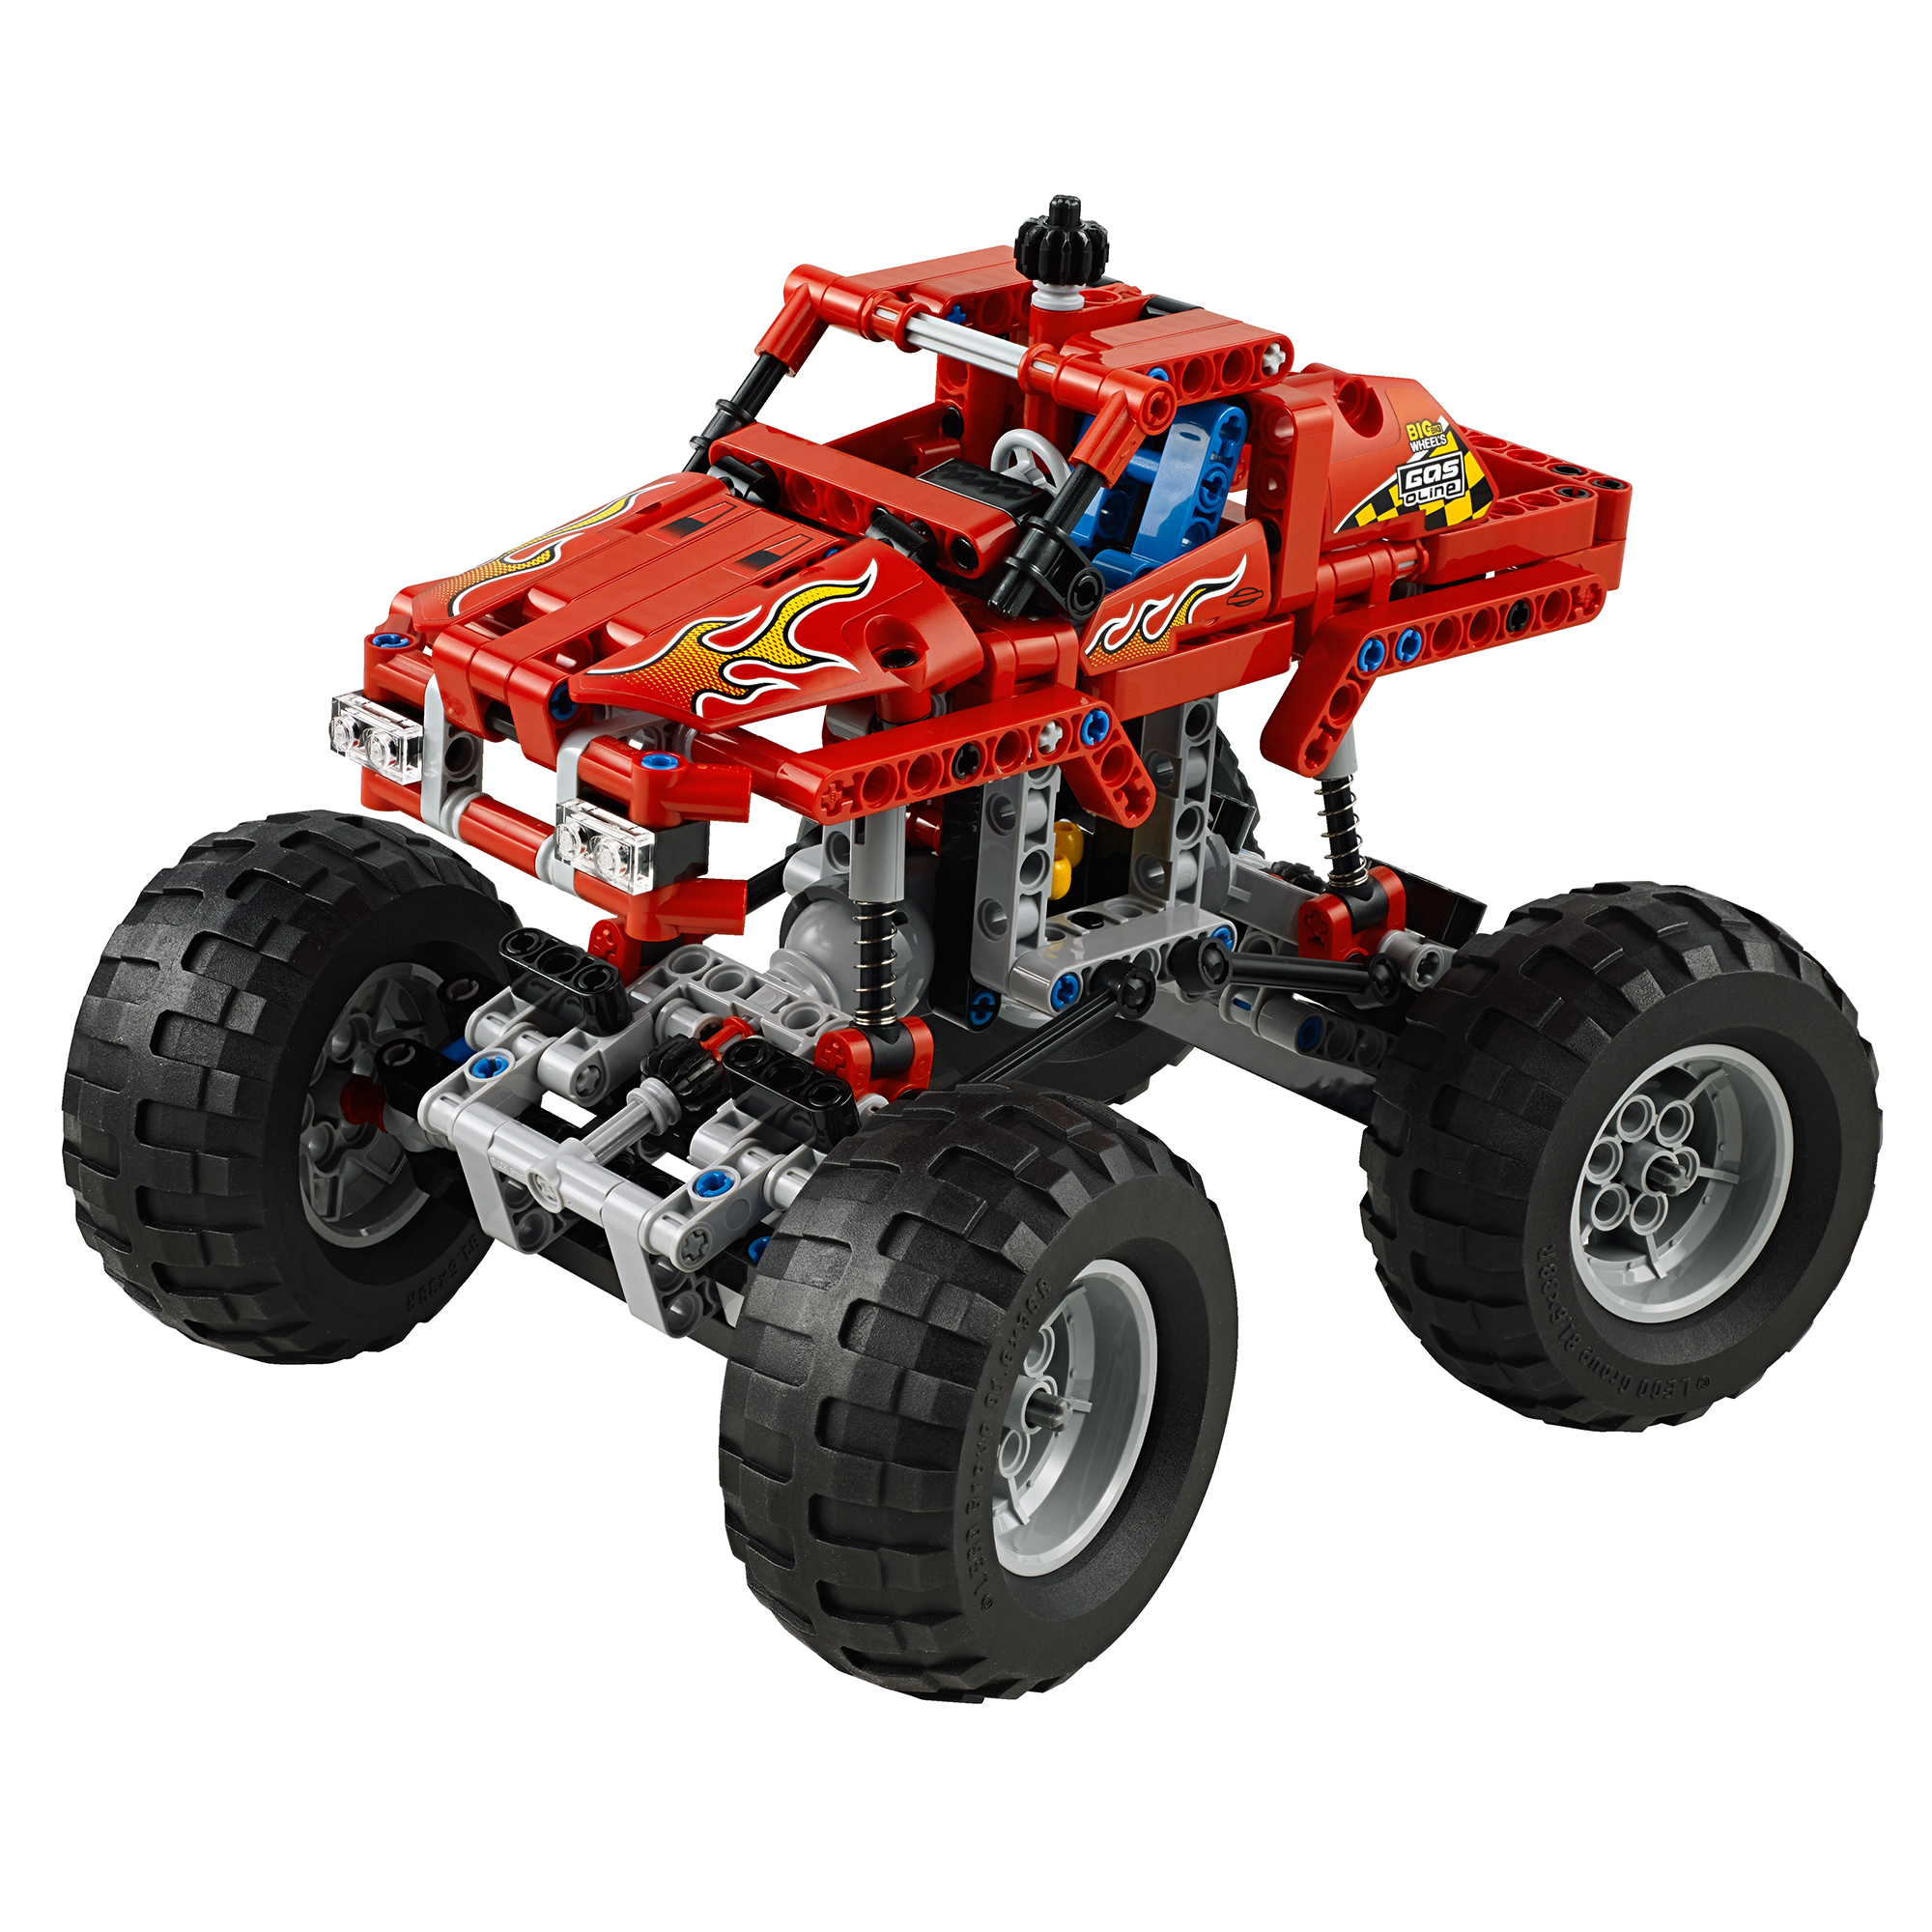 LEGO Technic Monster Truck 42005 - Children's Birthday Your Kids Bday - 7th Birthday